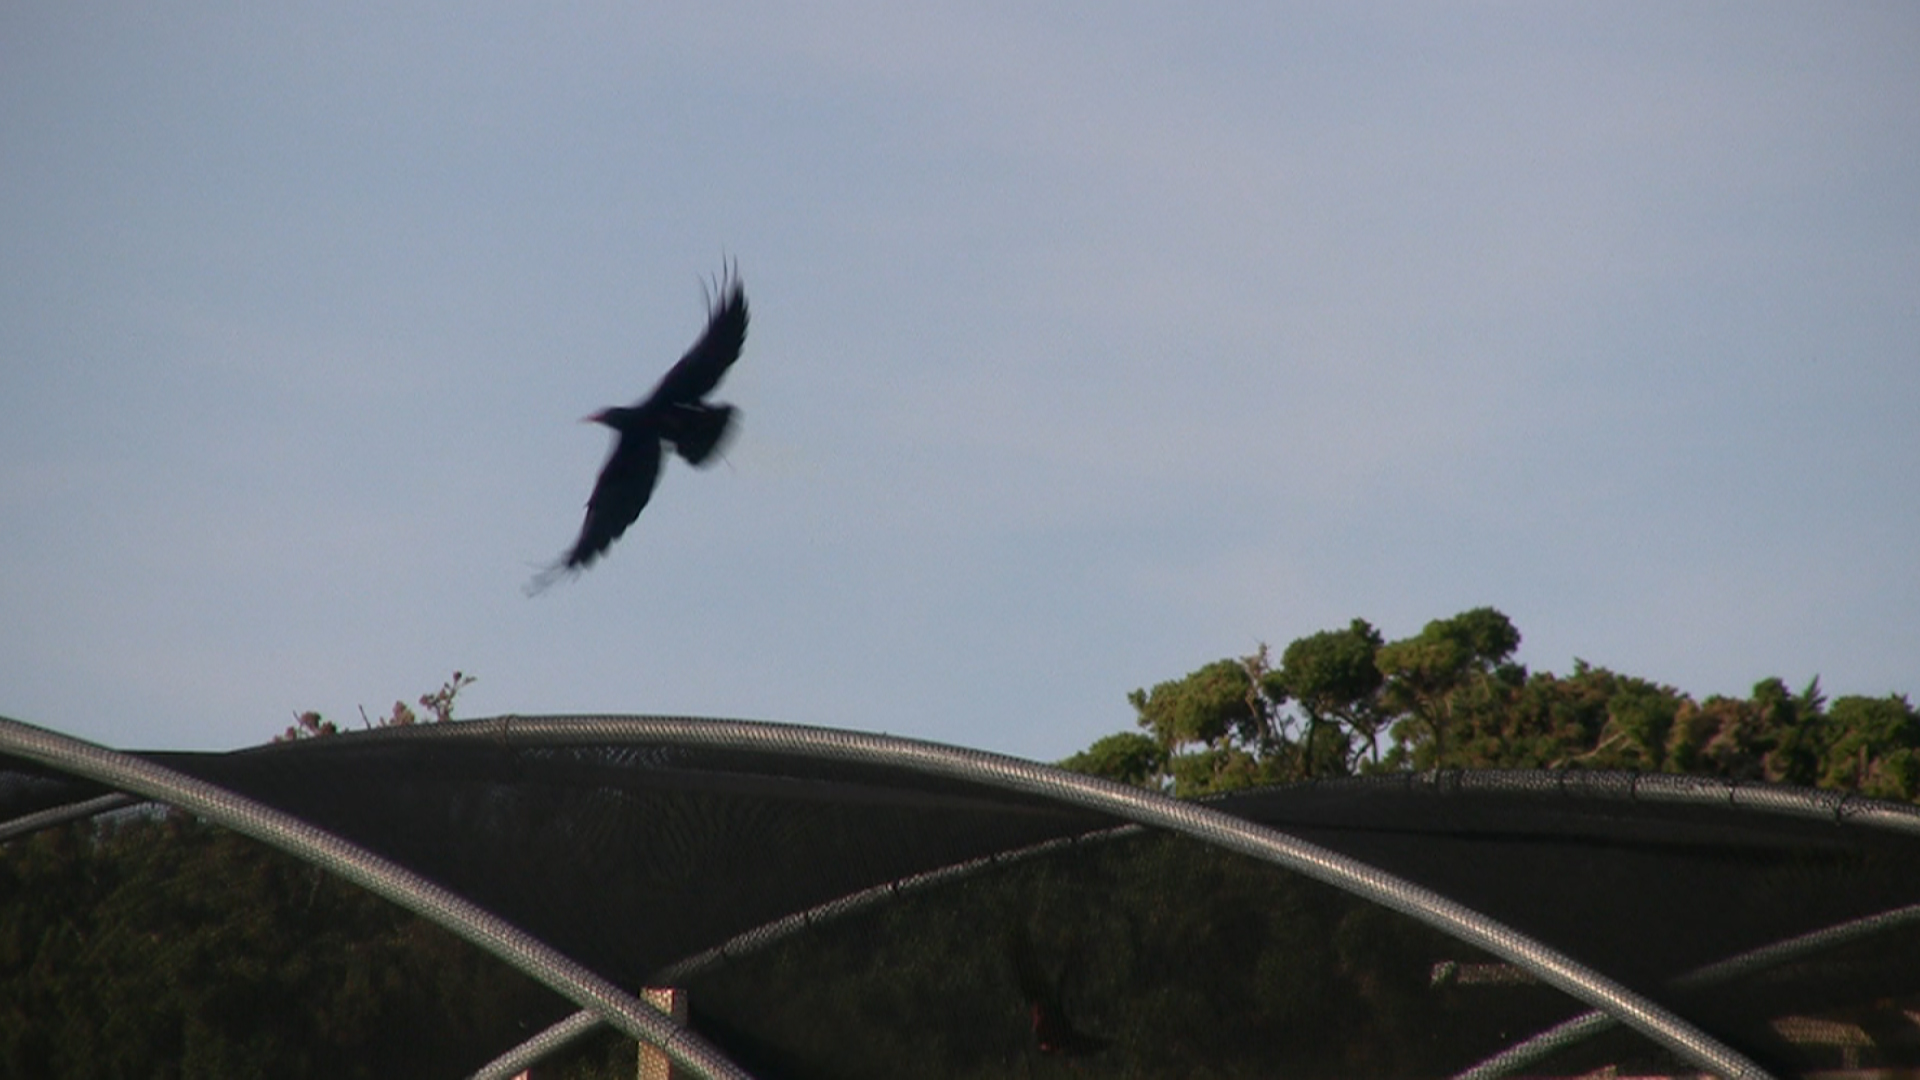 Maiden flight of green. Photo by Annette Lowe